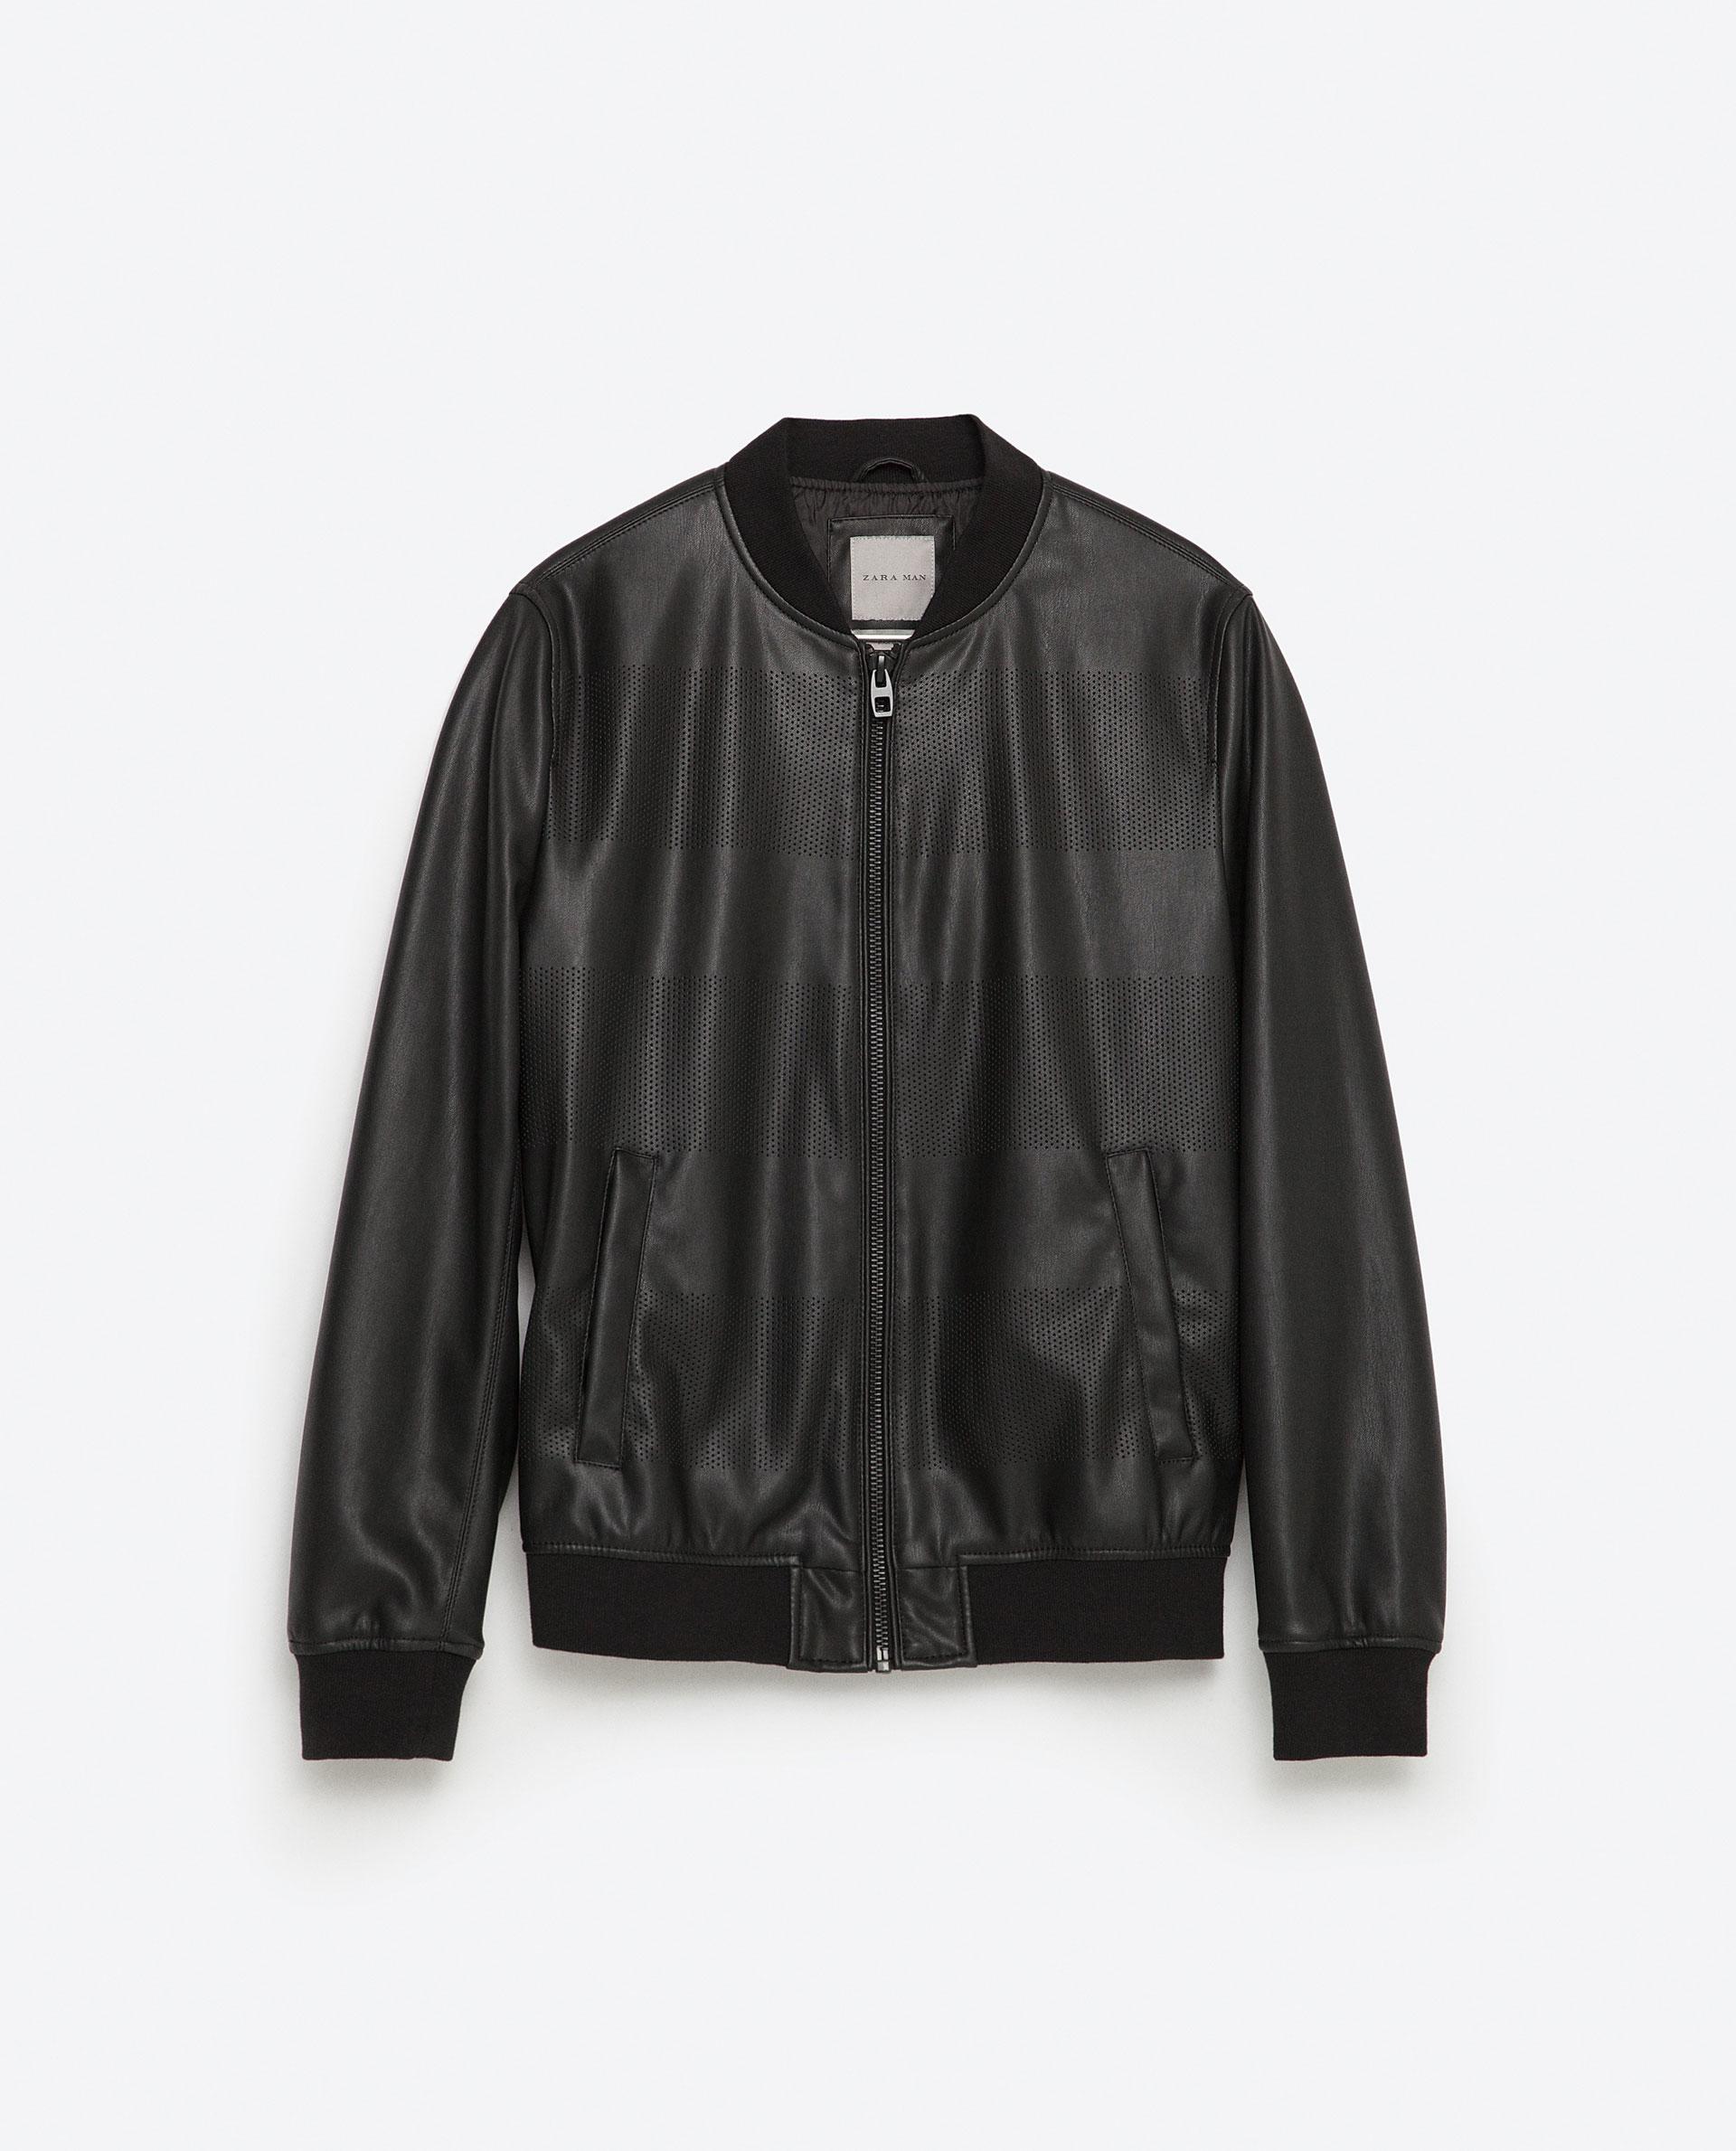 Zara Faux Leather Bomber Jacket in Black for Men   Lyst